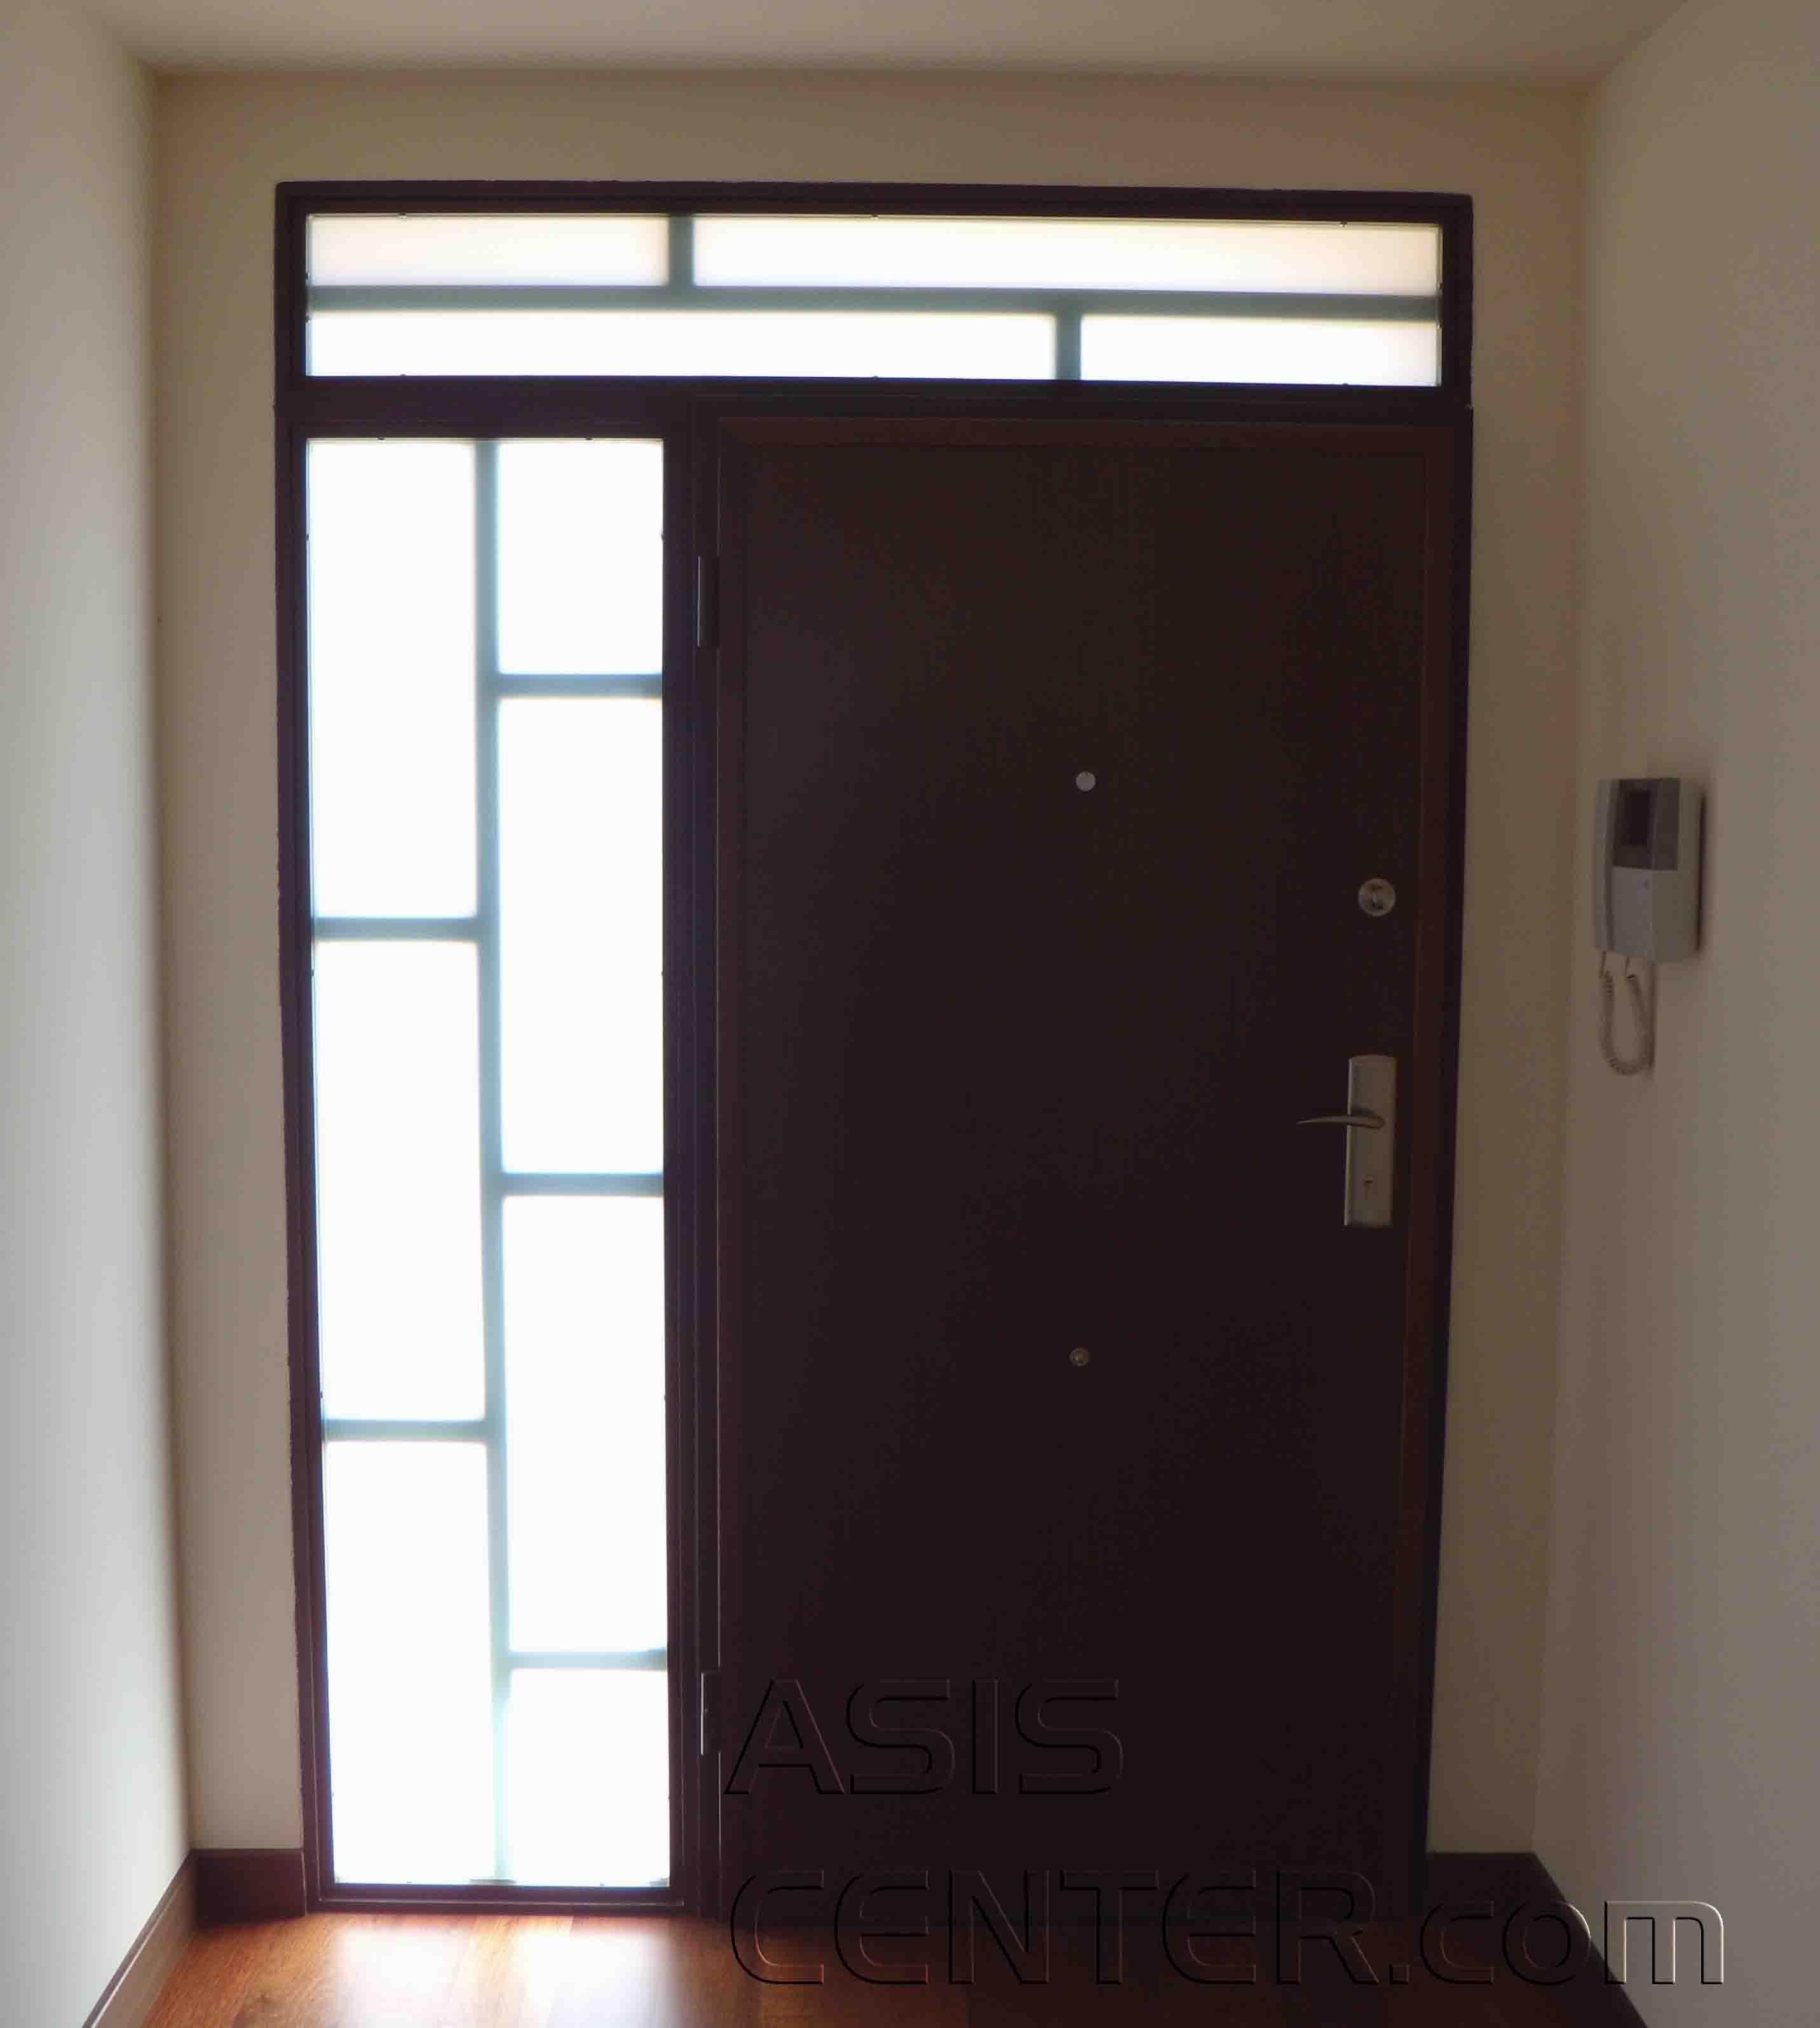 Fijos acorazados para puertas acorazadas blindadas - Puertas blindadas exterior ...